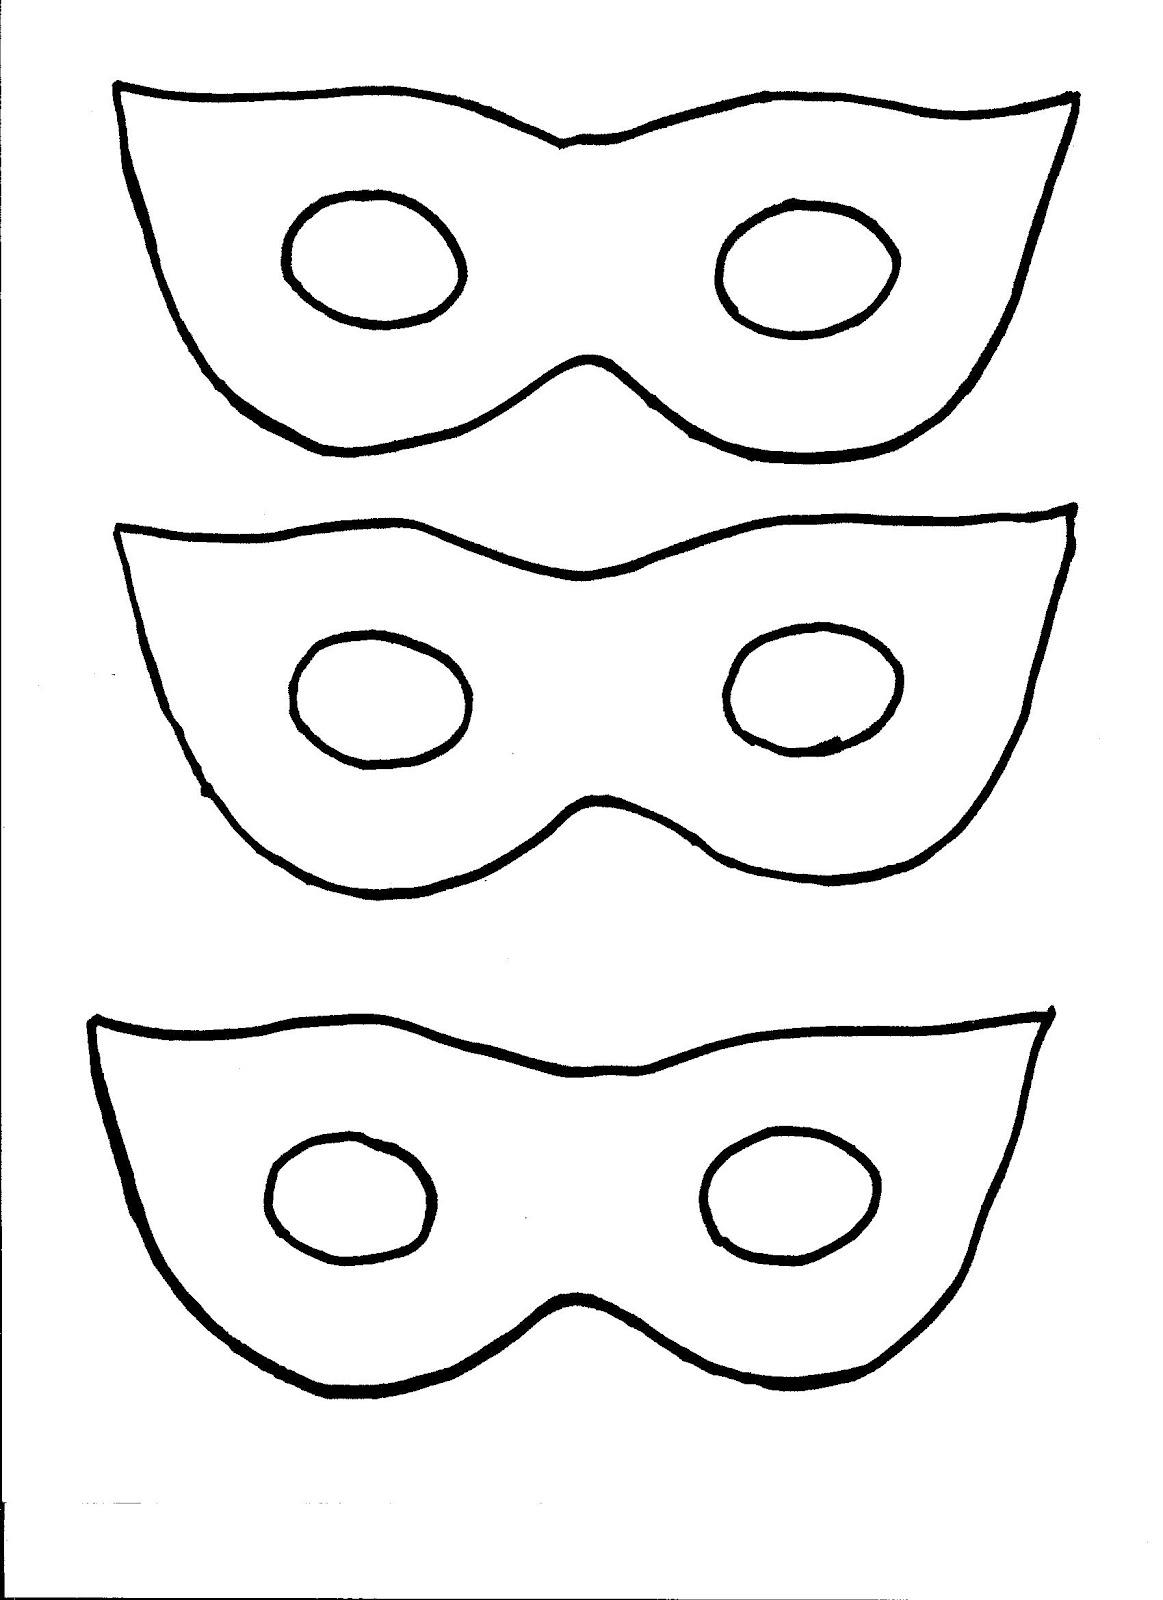 Super Hero Mask Template   Clipart Panda - Free Clipart Images - Free Printable Superhero Masks